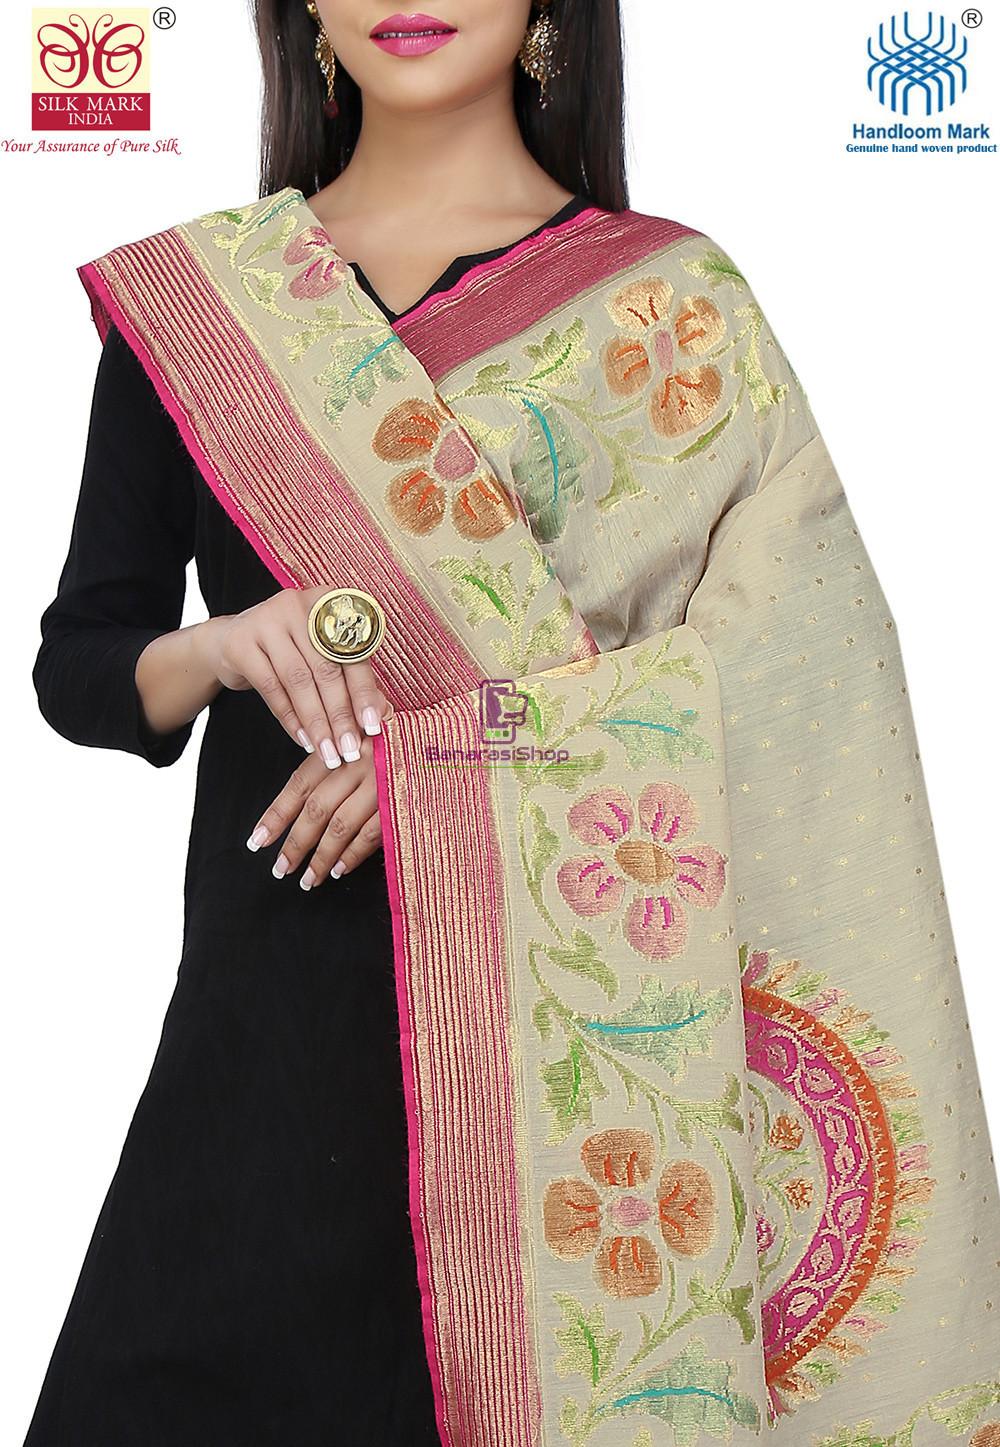 Handloom Banarasi Pure Muga Silk Dupatta in Light Beige and Fuchsia 2